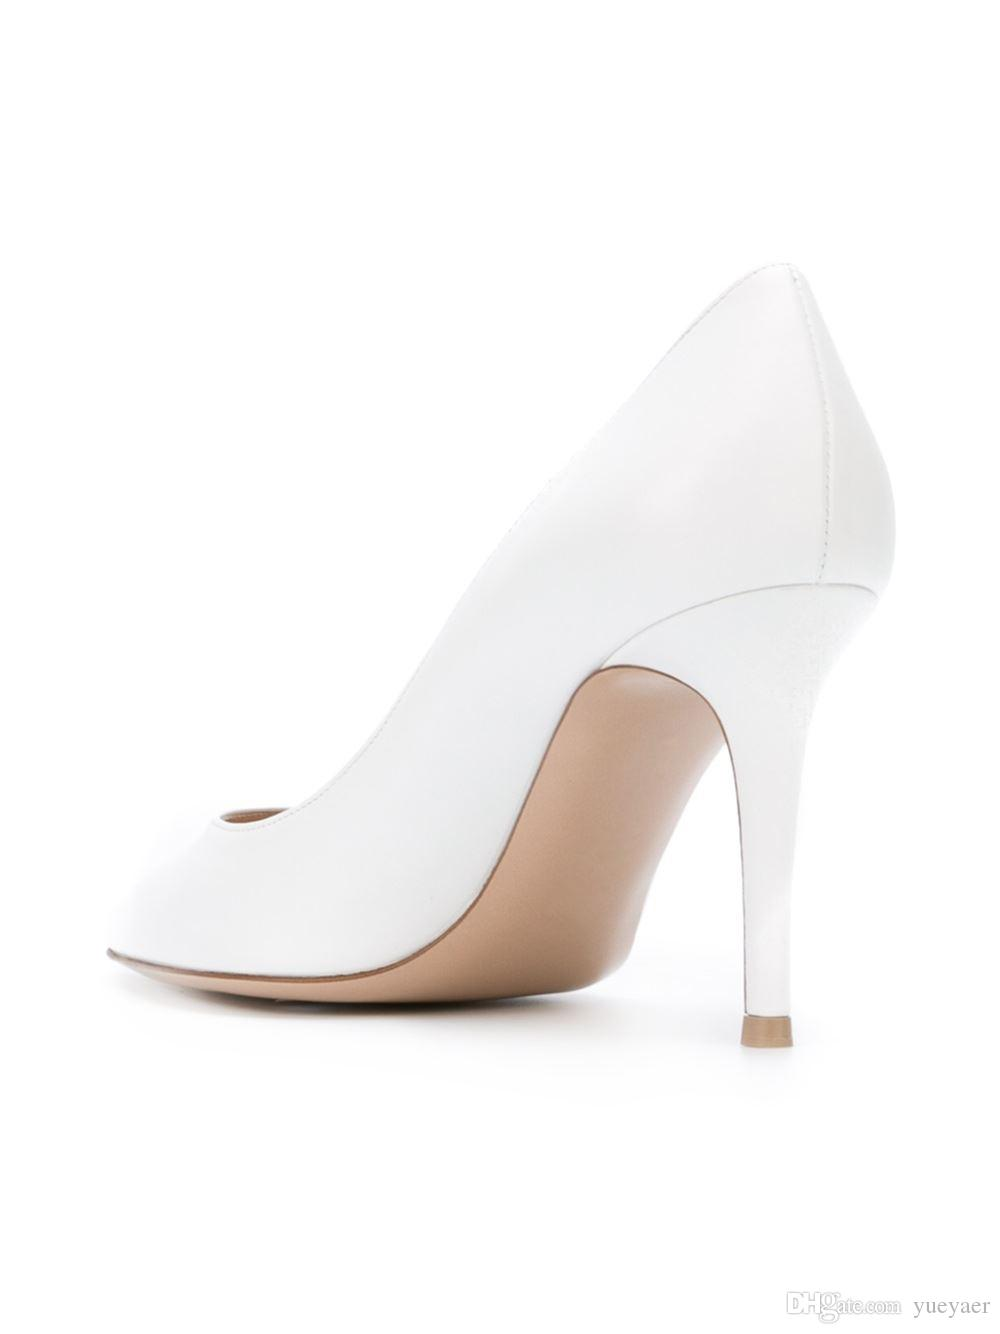 Zandina Handmade Moda 8 cm Bombas de Salto Alto Estilo Simples Slip-on Pontudo Festa de Casamento Stiletto Sapatos de Casamento Branco-camurça K331